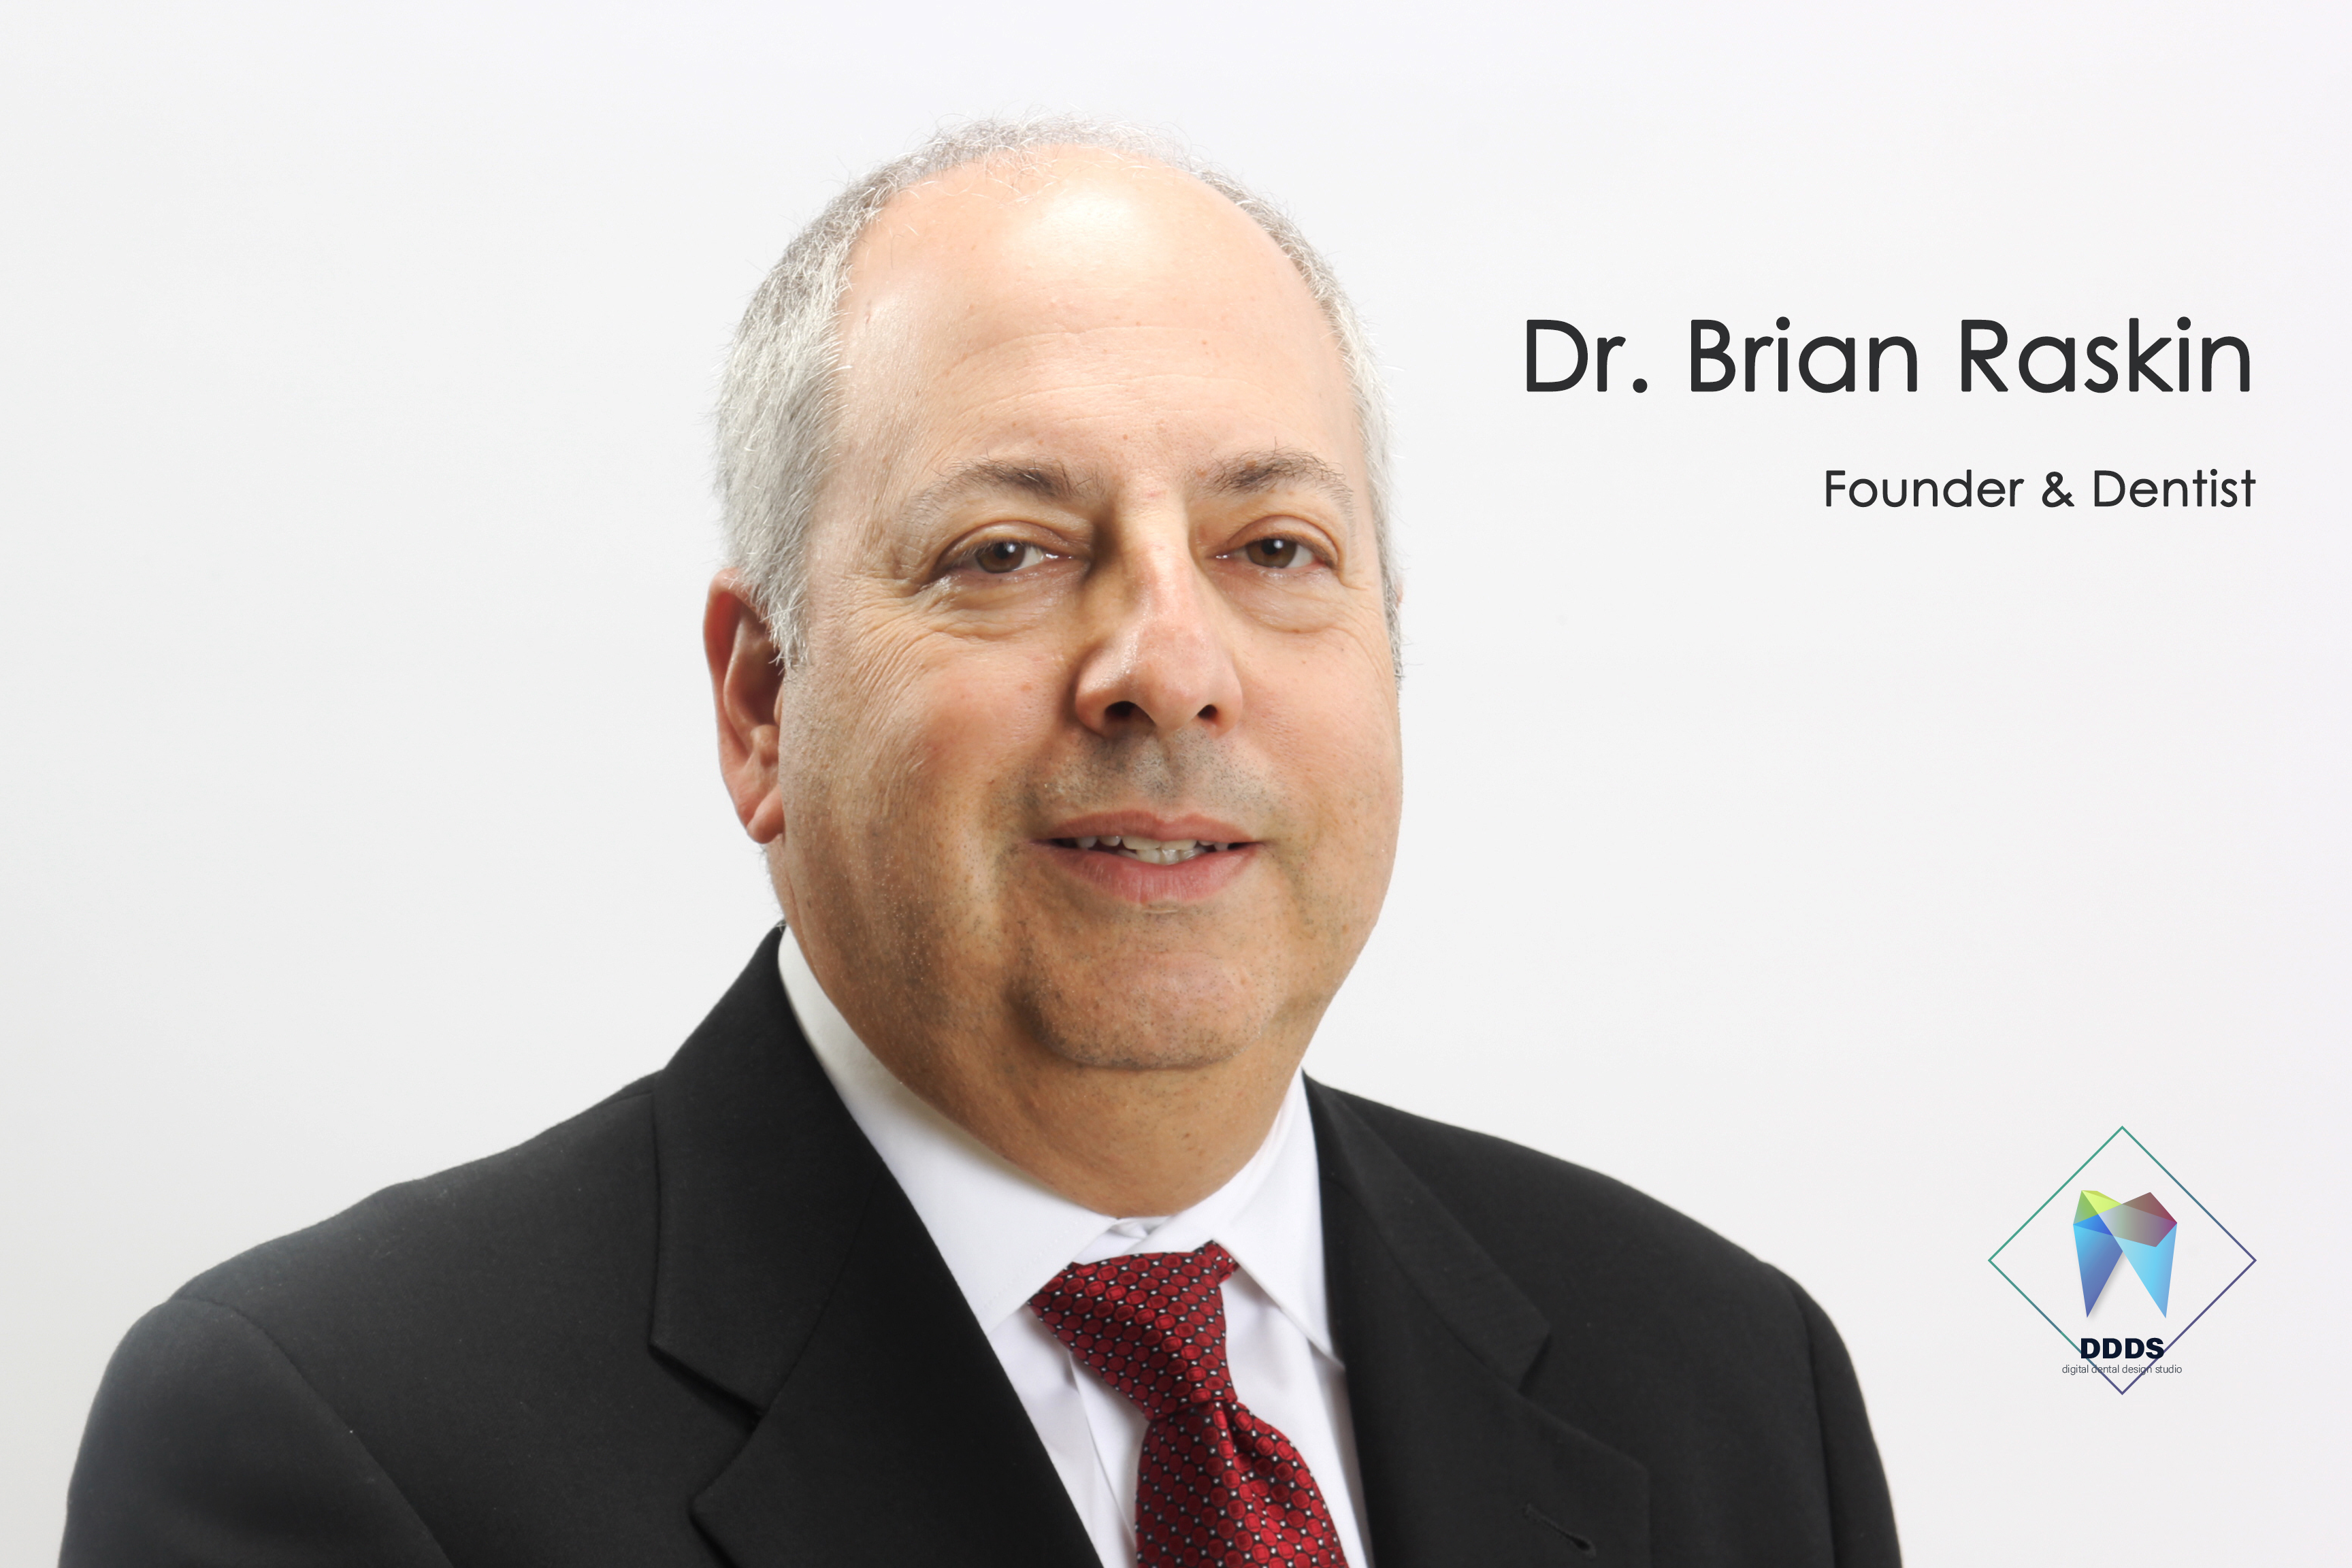 Dr. Brian Raskin